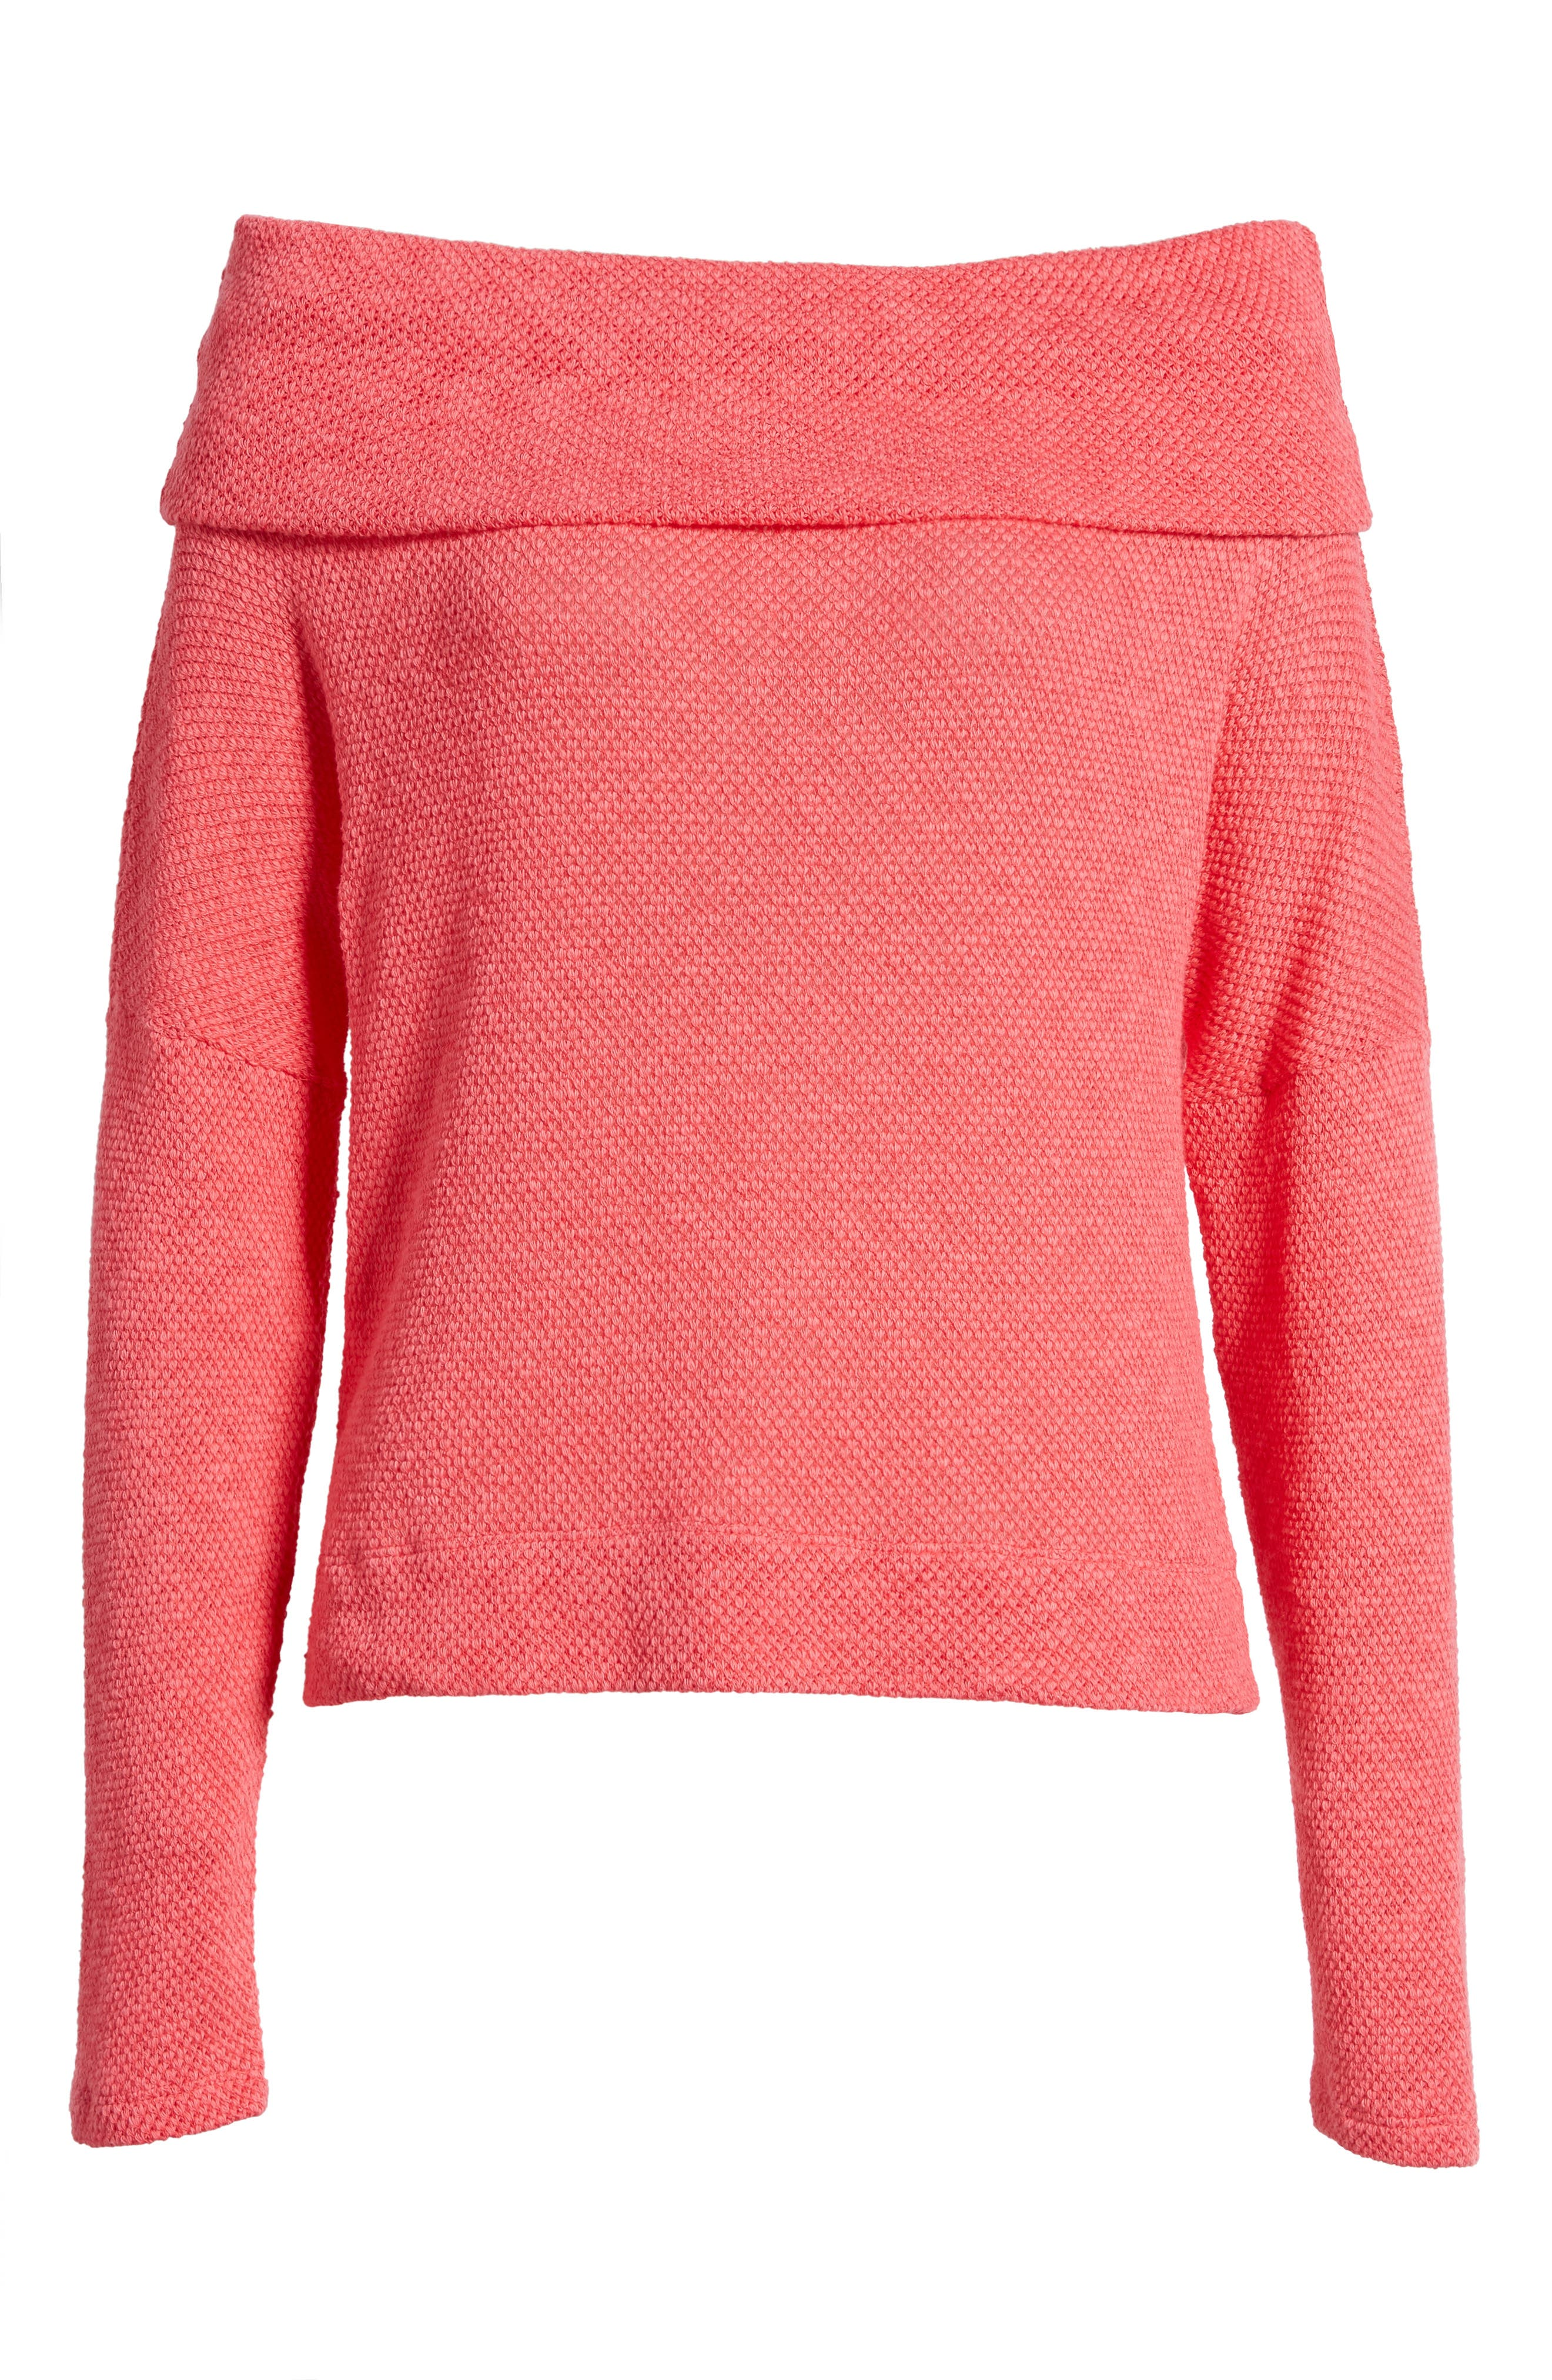 Convertible Neck Knit Pullover,                             Alternate thumbnail 7, color,                             Pink Ribbon